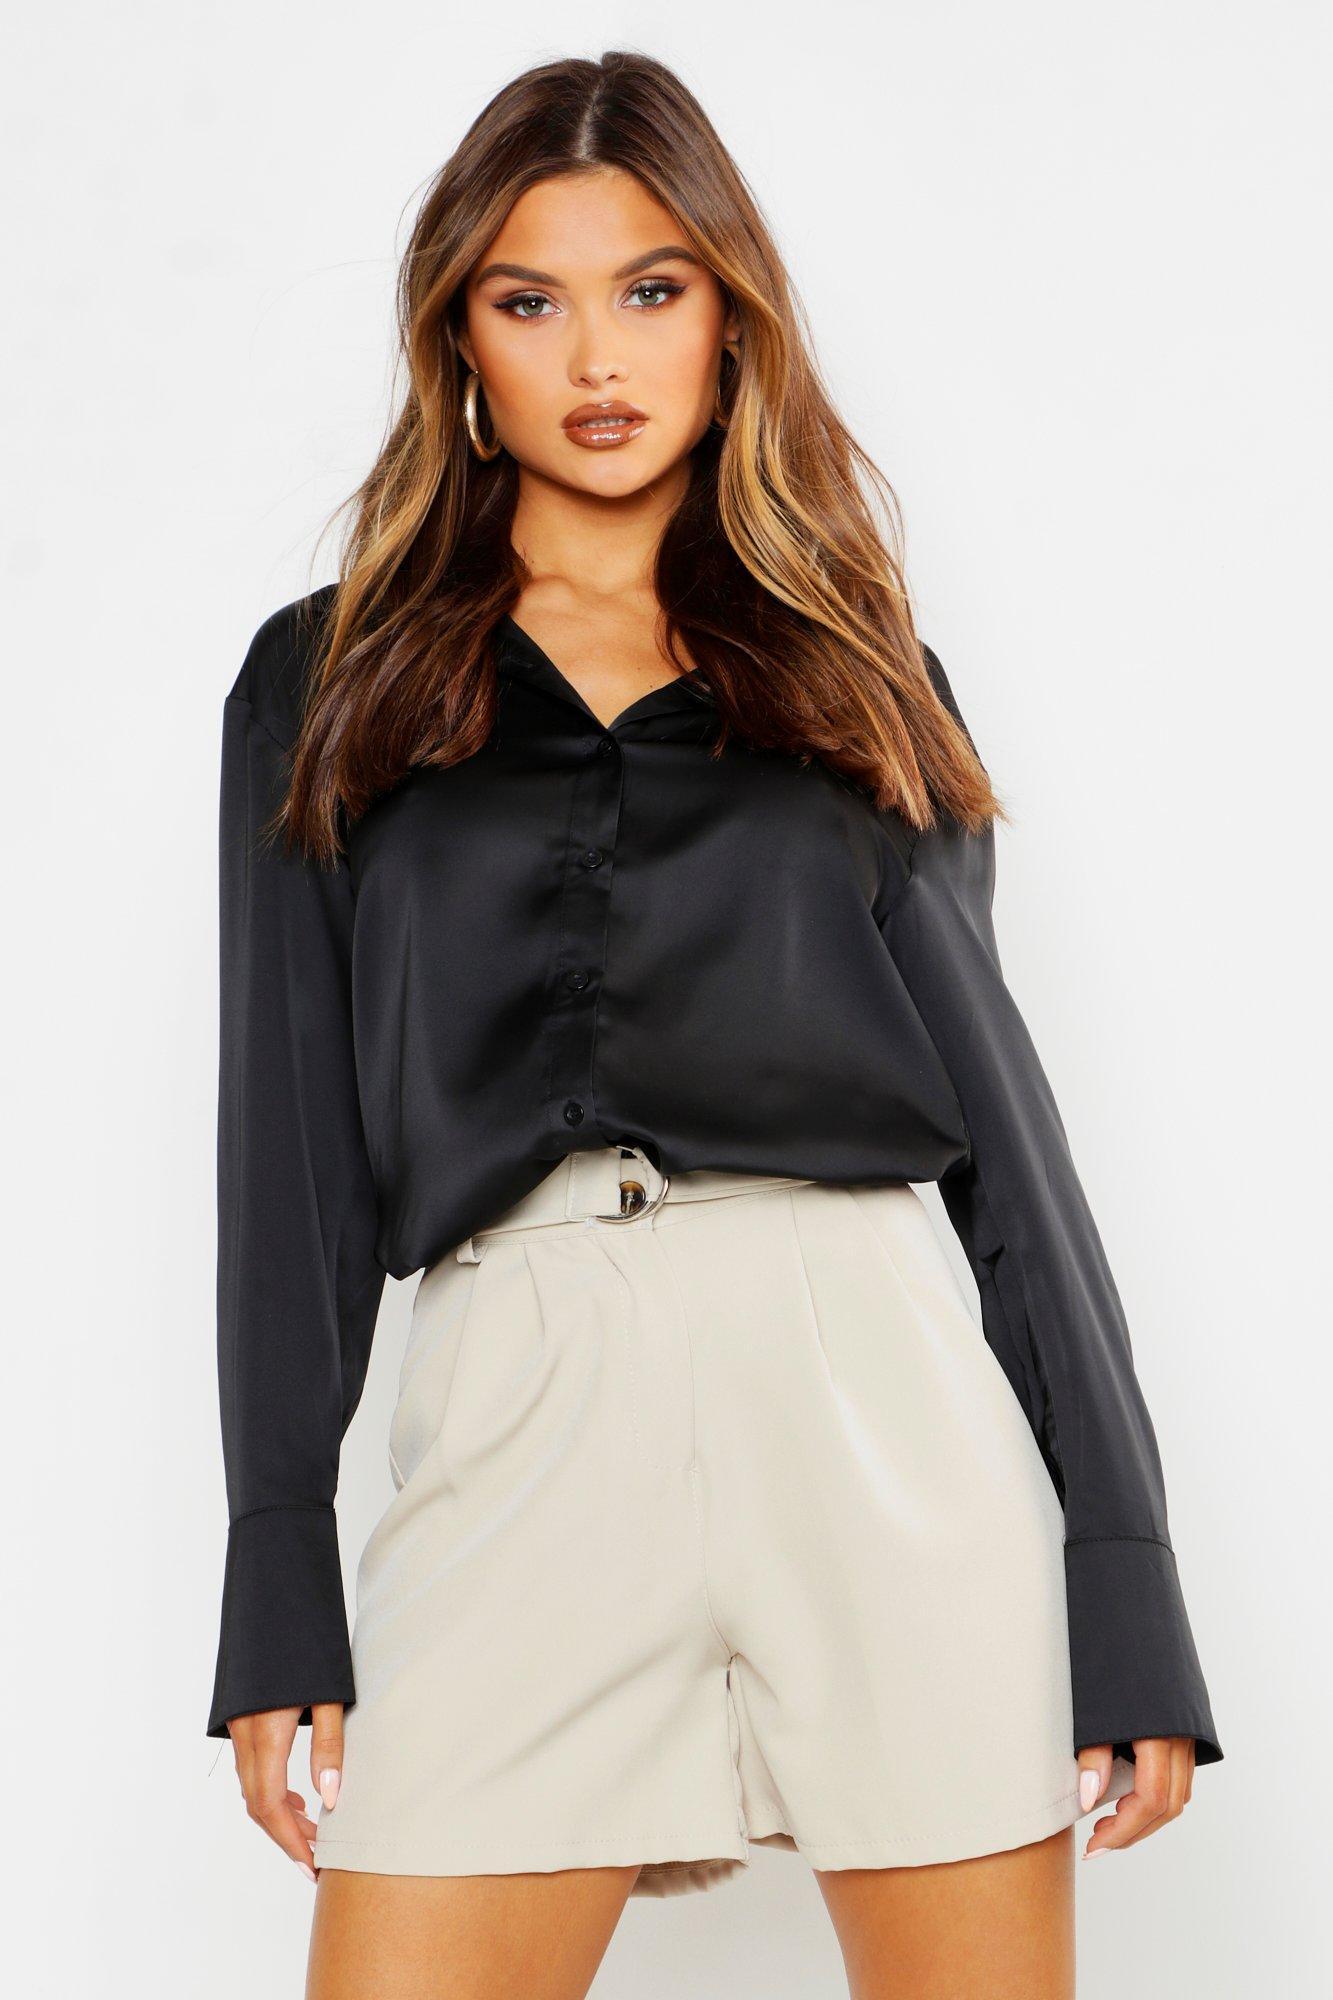 Womens Premium-Hemd in Satin-Optik - black - 36, Black - Boohoo.com